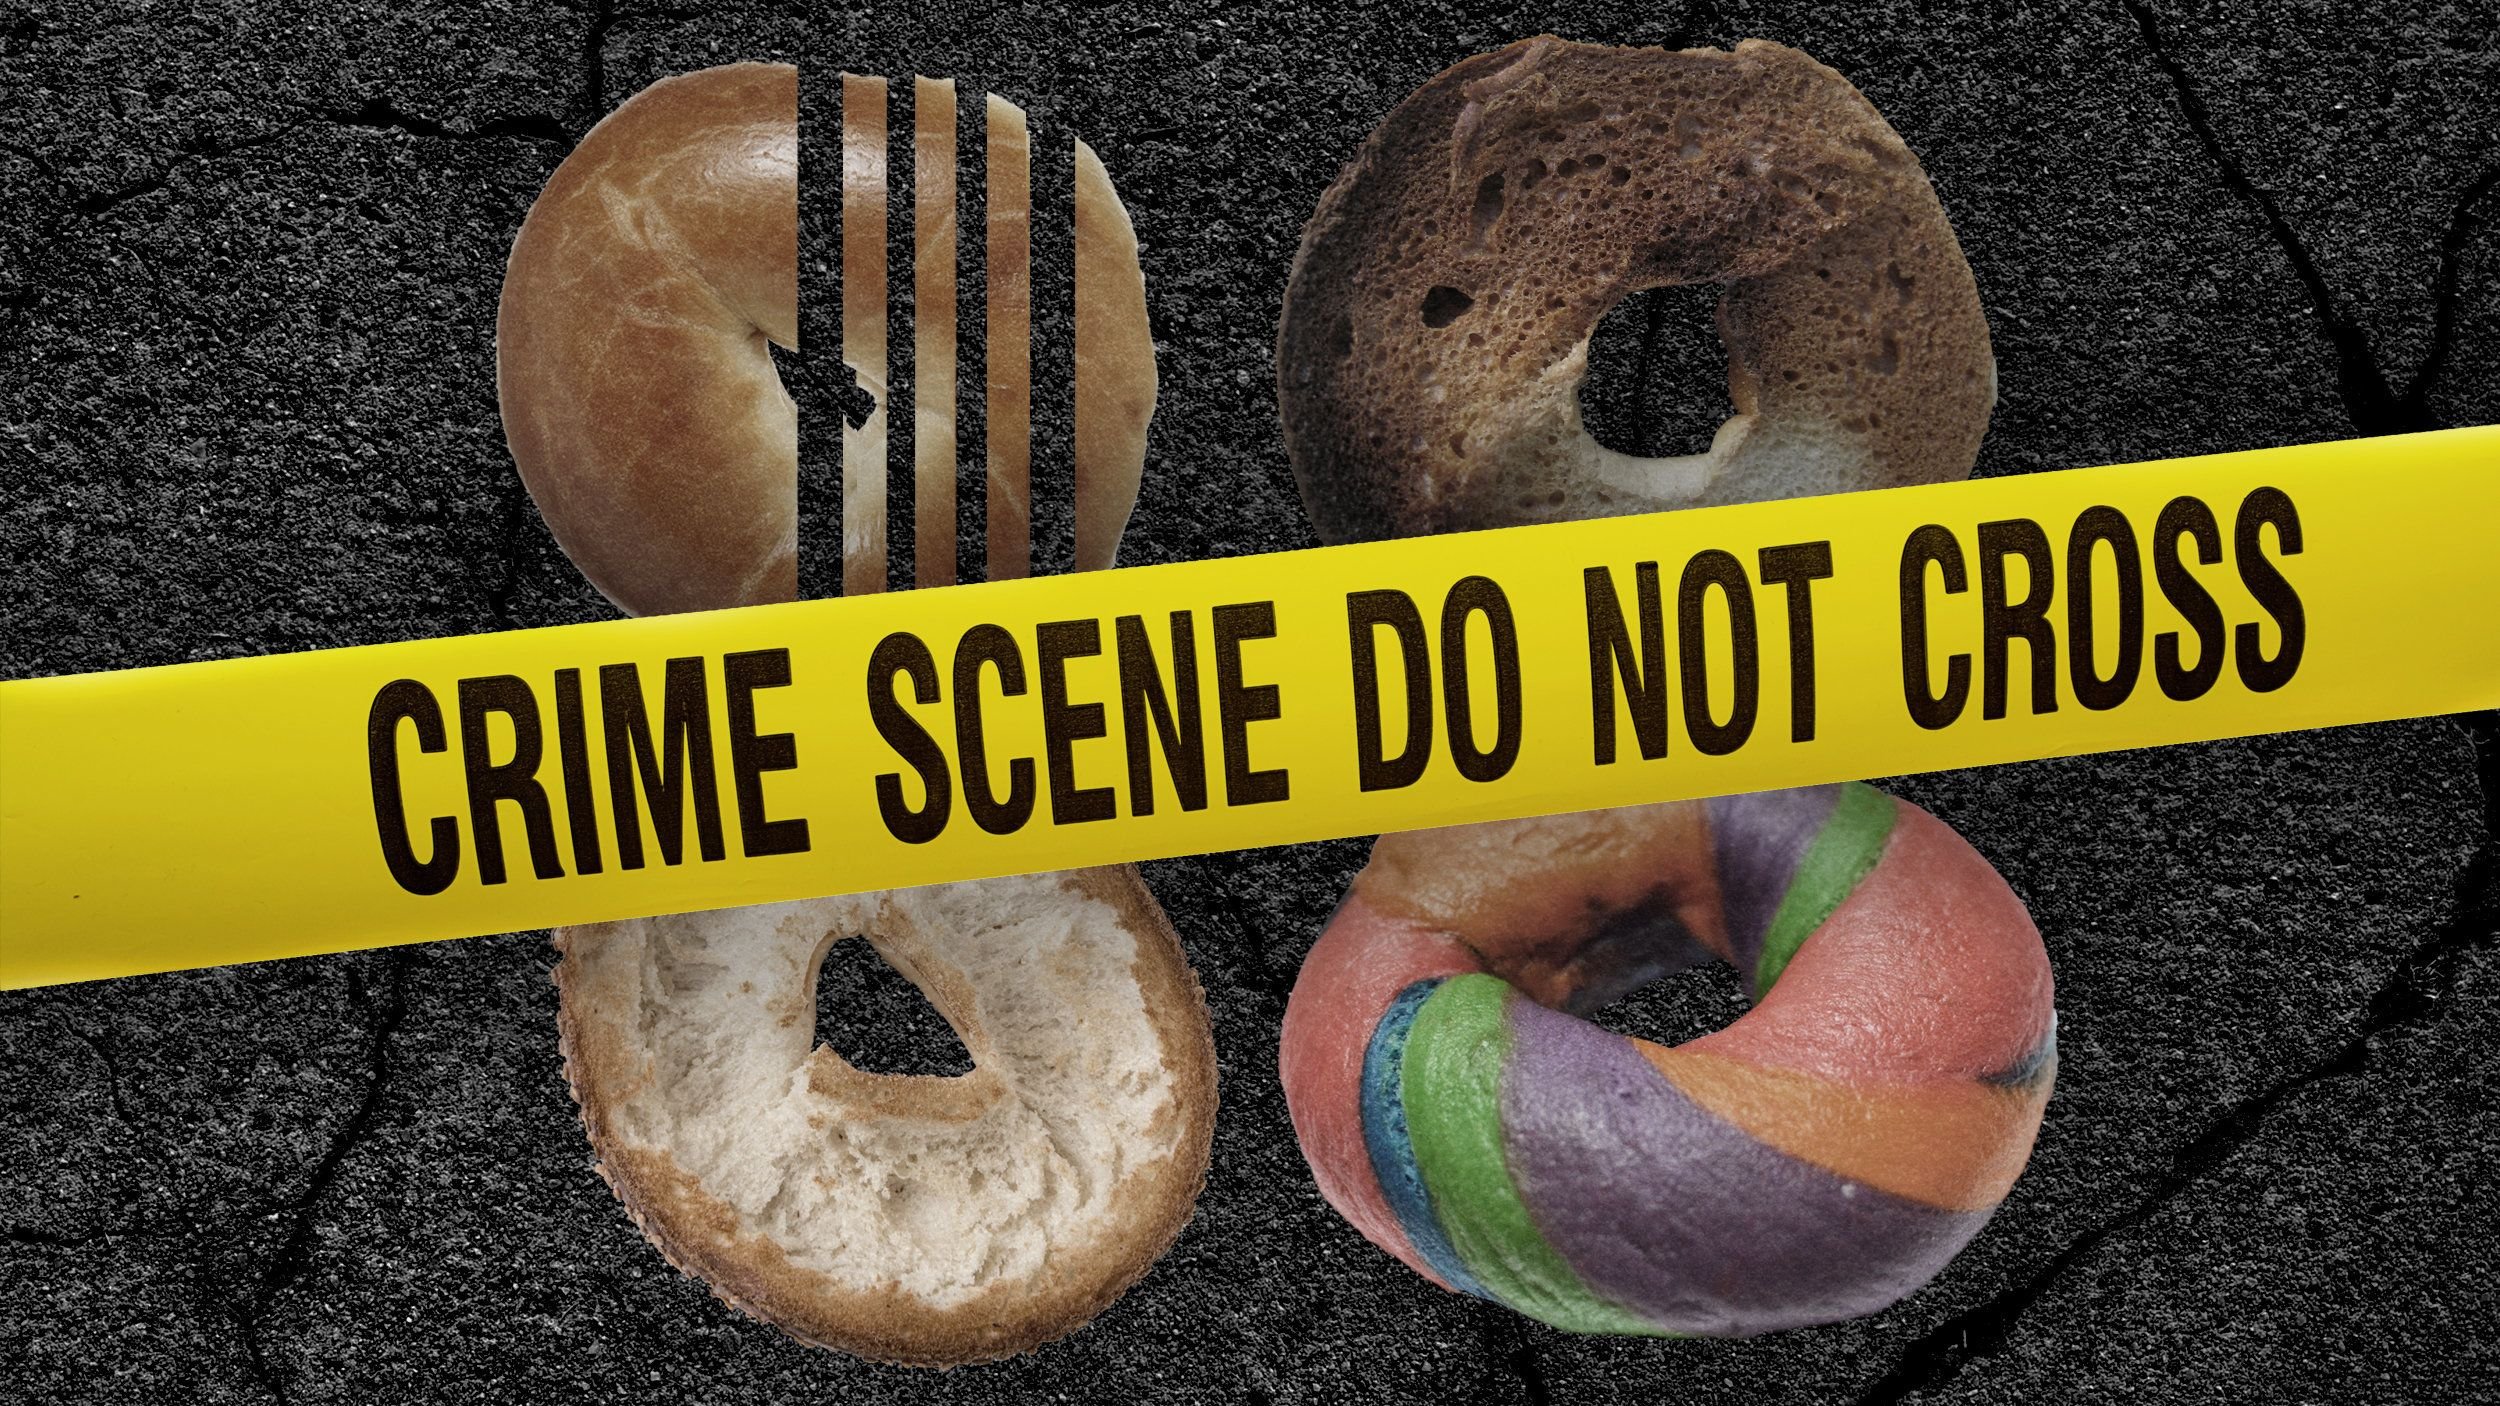 Crimes against bagels.